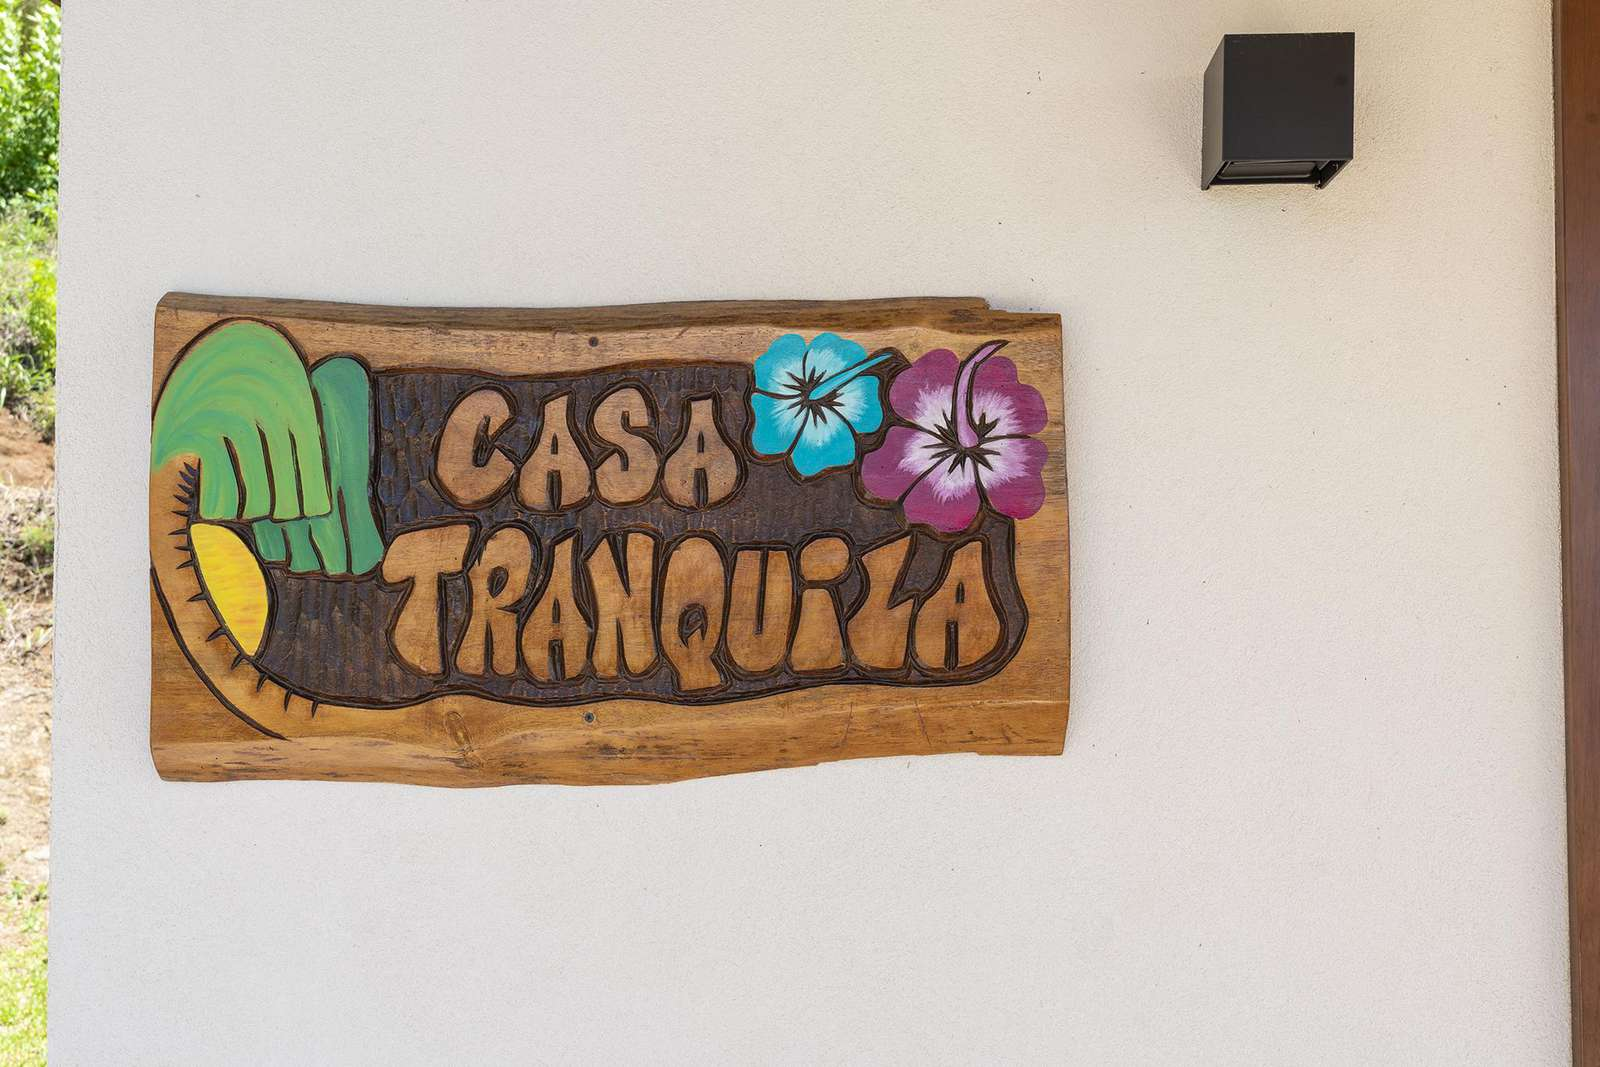 Welcome to Casa Tranquila